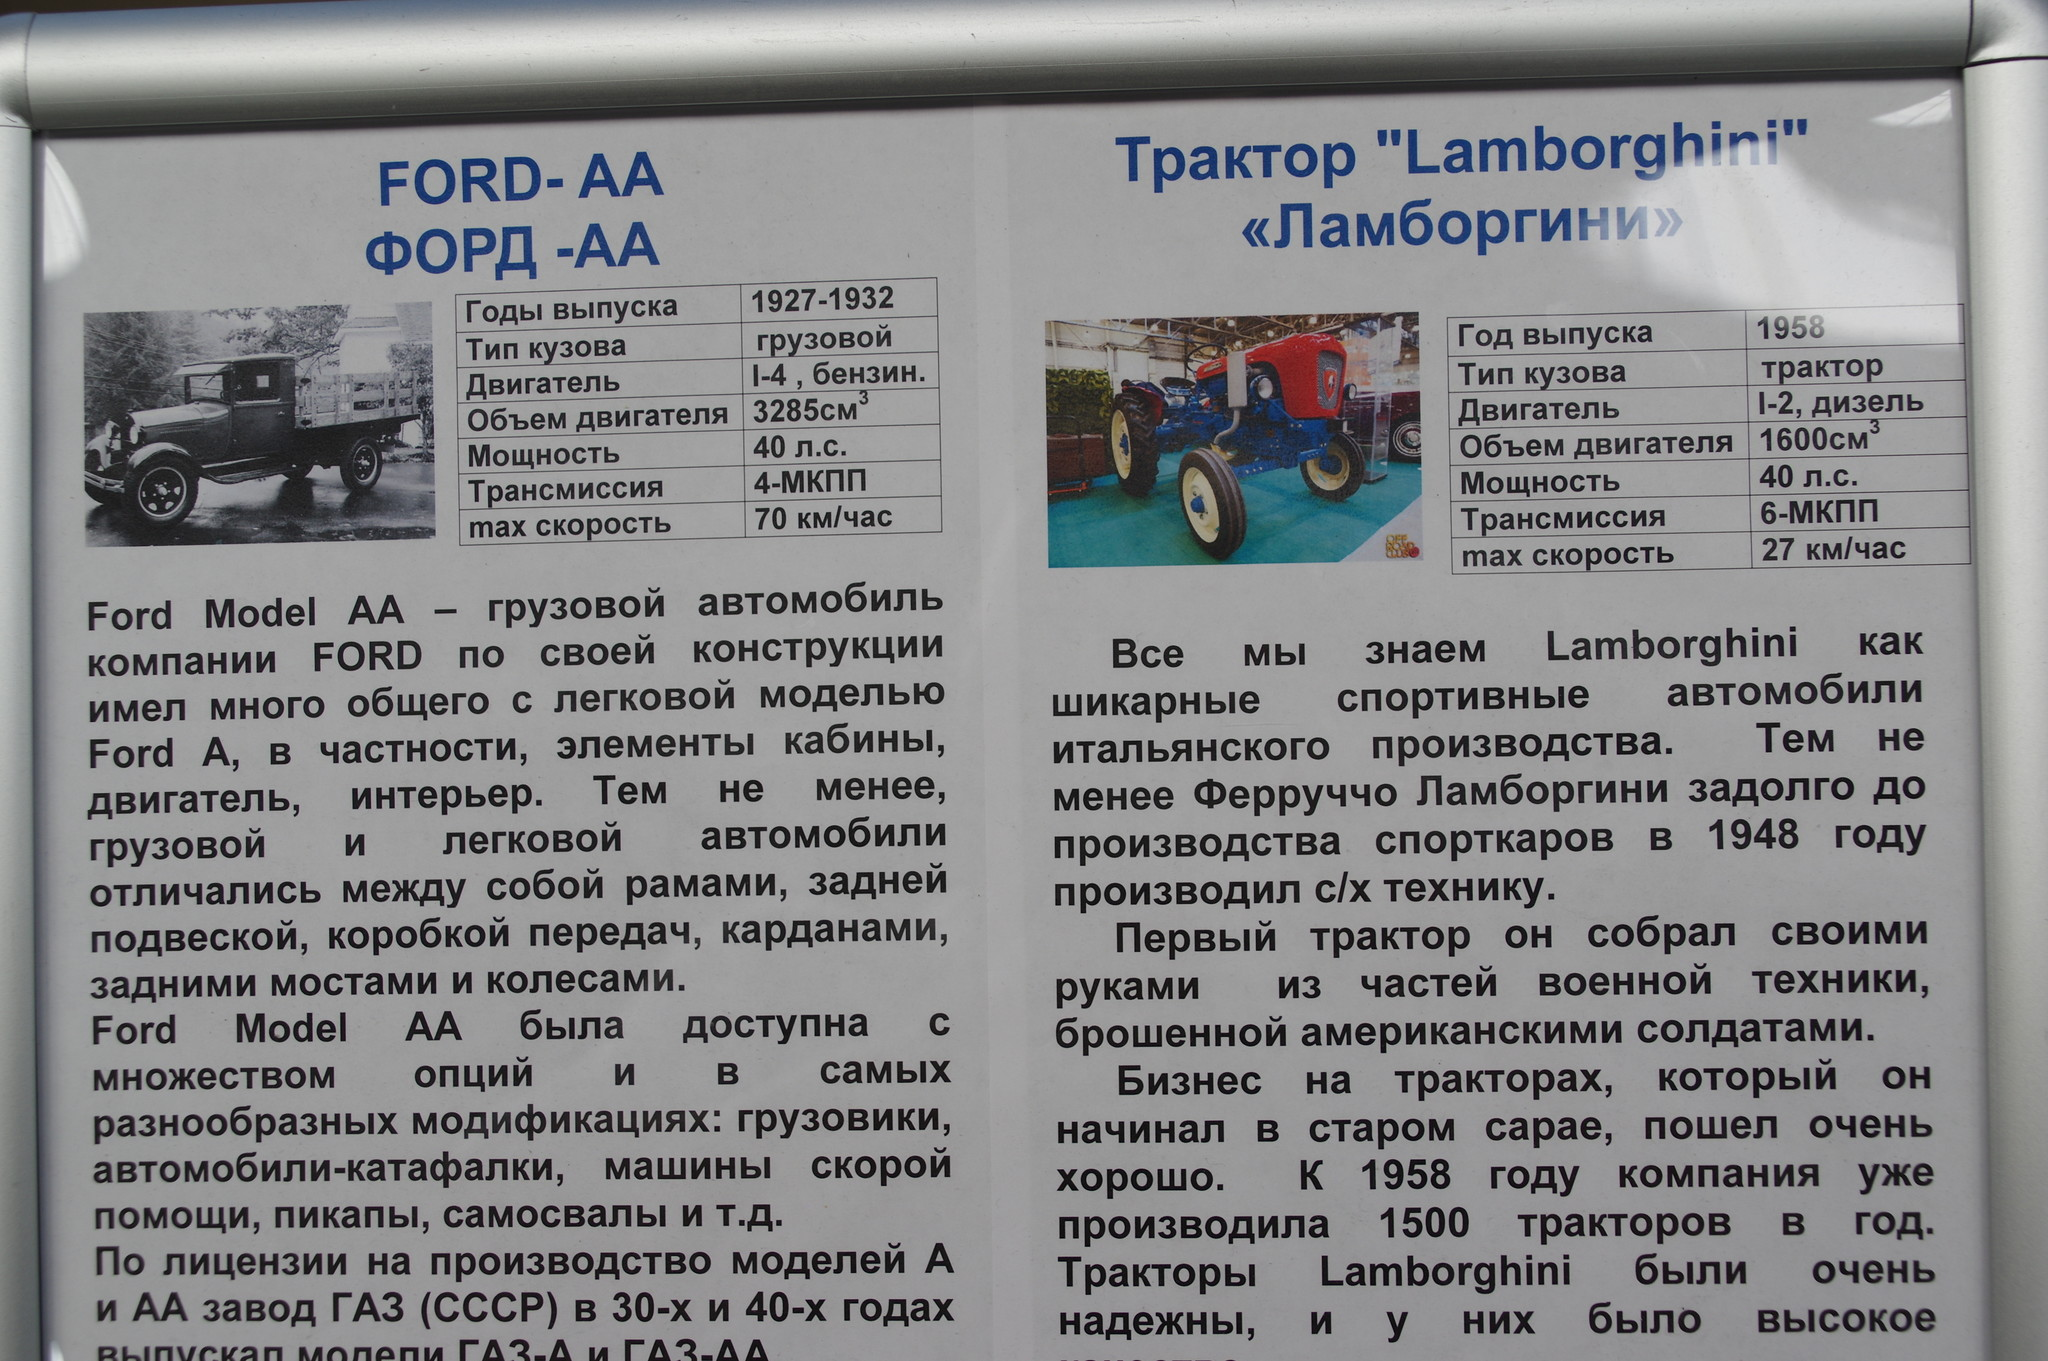 Грузовой автомобиль Ford AA